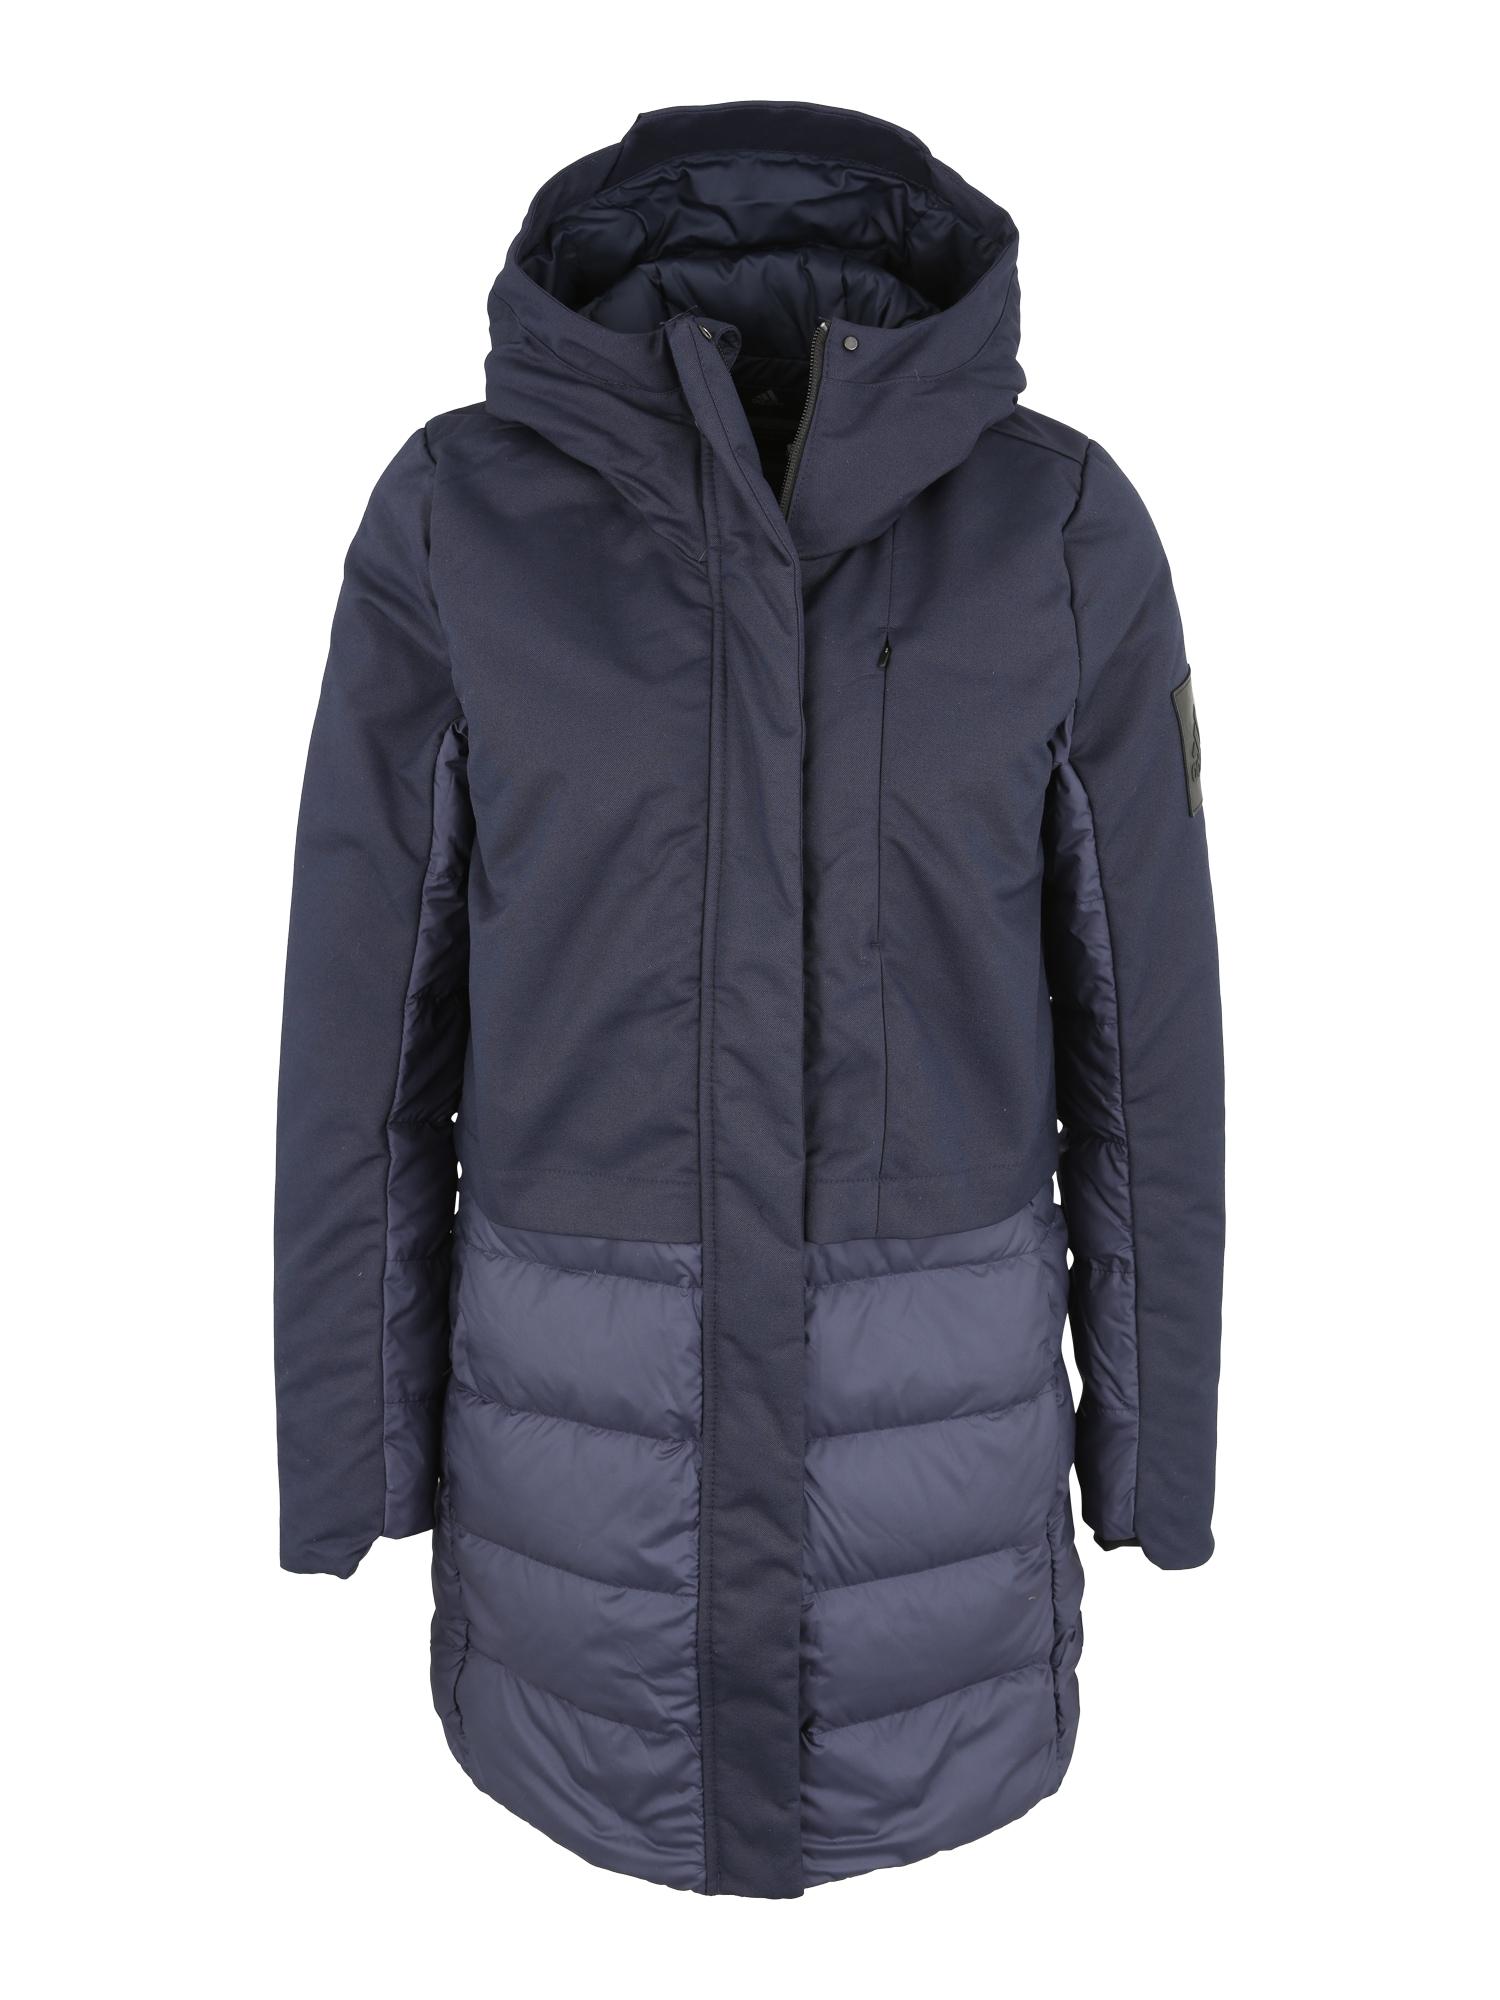 Outdoorový kabát tmavě modrá ADIDAS PERFORMANCE